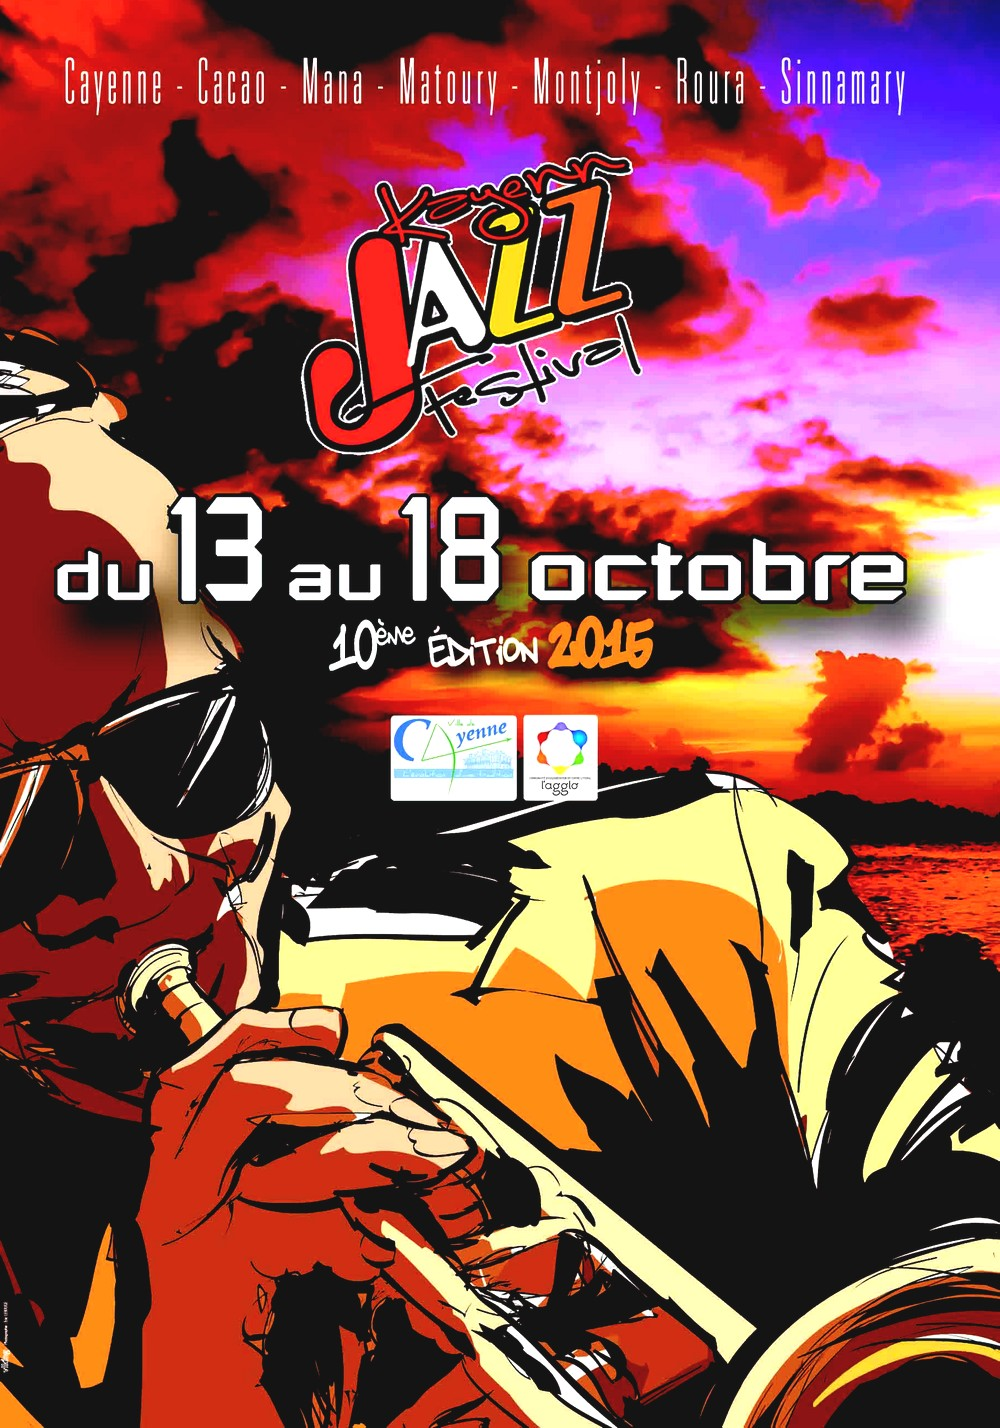 Kayenne Jazz Festival 2015